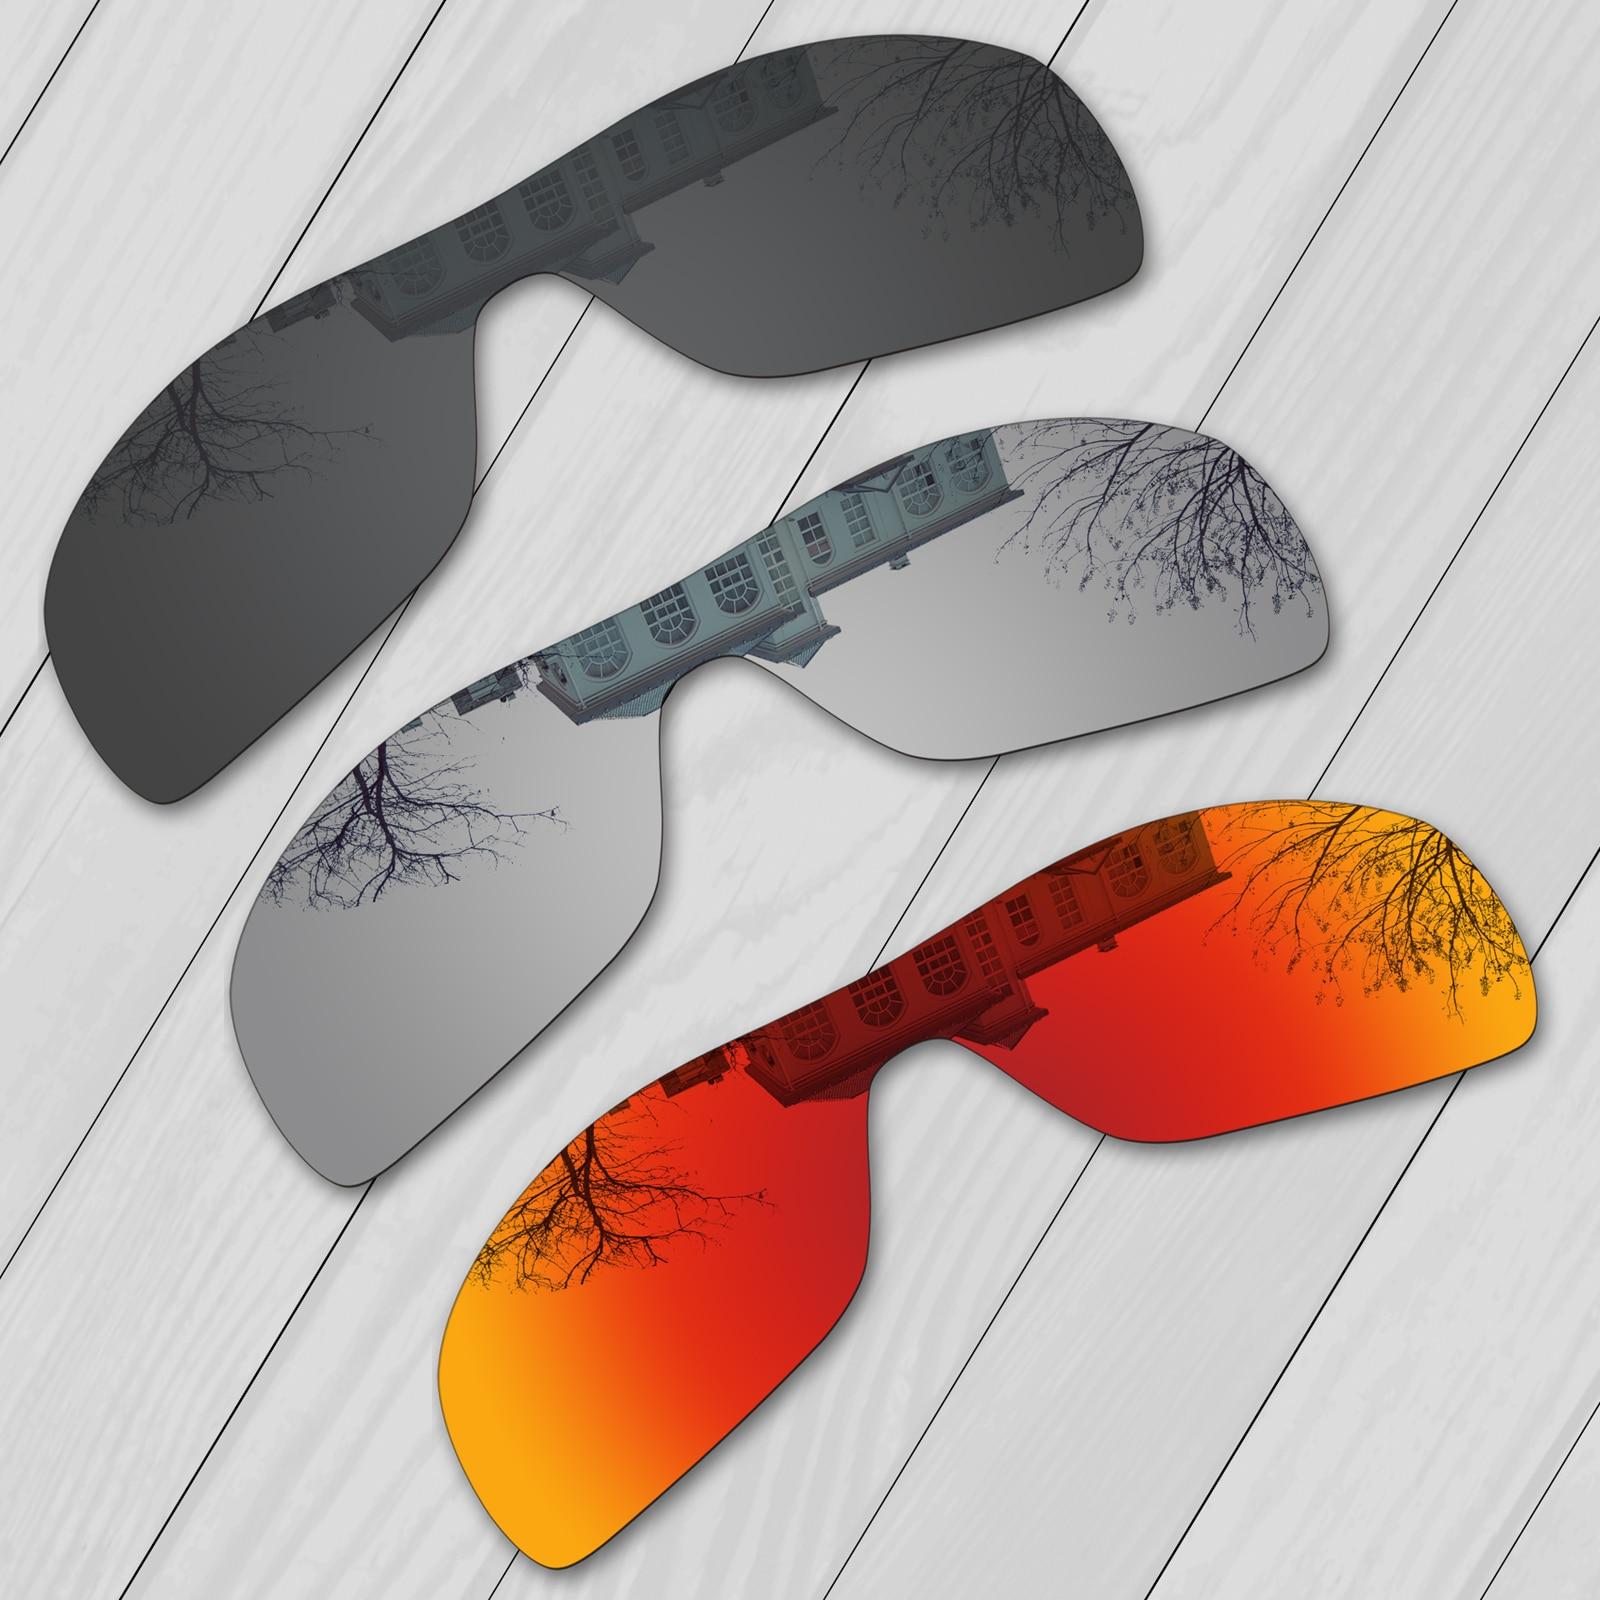 E.O.S 3 Pieces Black & Silver & Fire Red Polarized ReplacementLensesforOakleyTurbine Rotor OO9307 Sunglasses